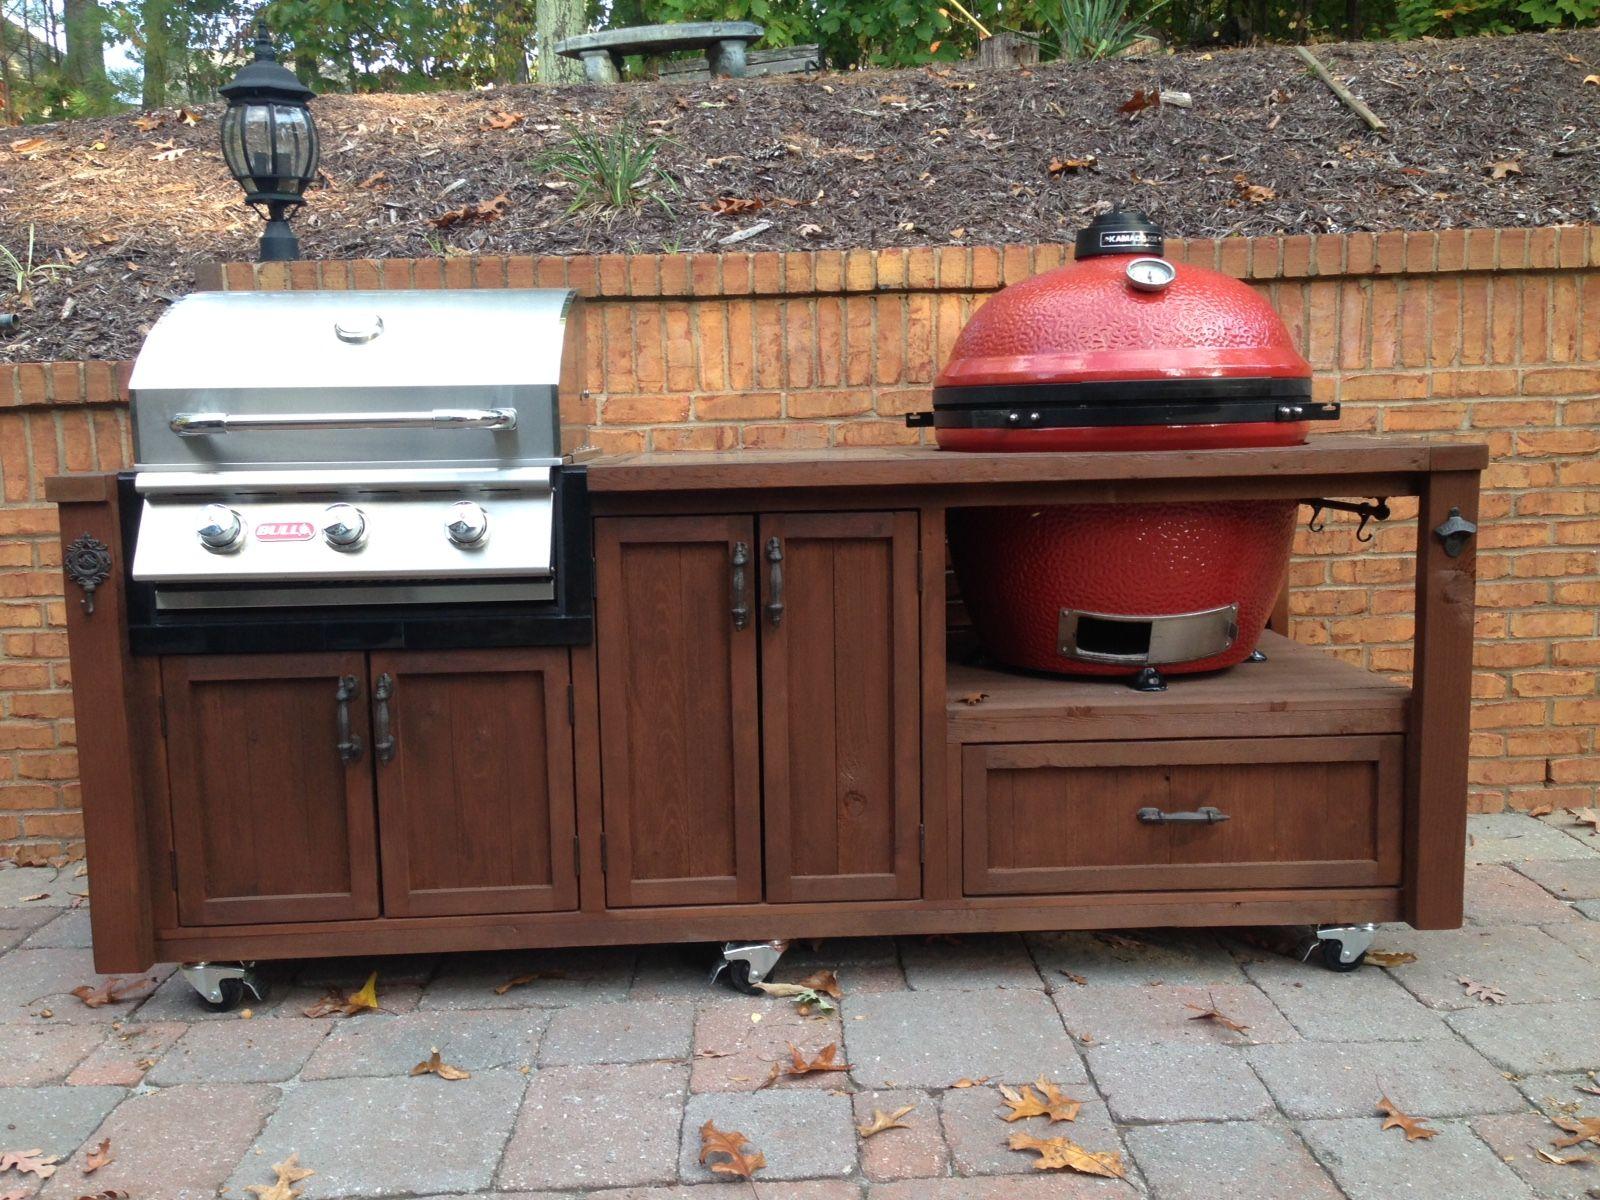 Kamado Joe Big Joe Twice As Hot Grill Table Grill Island Outdoor Kitchen Design